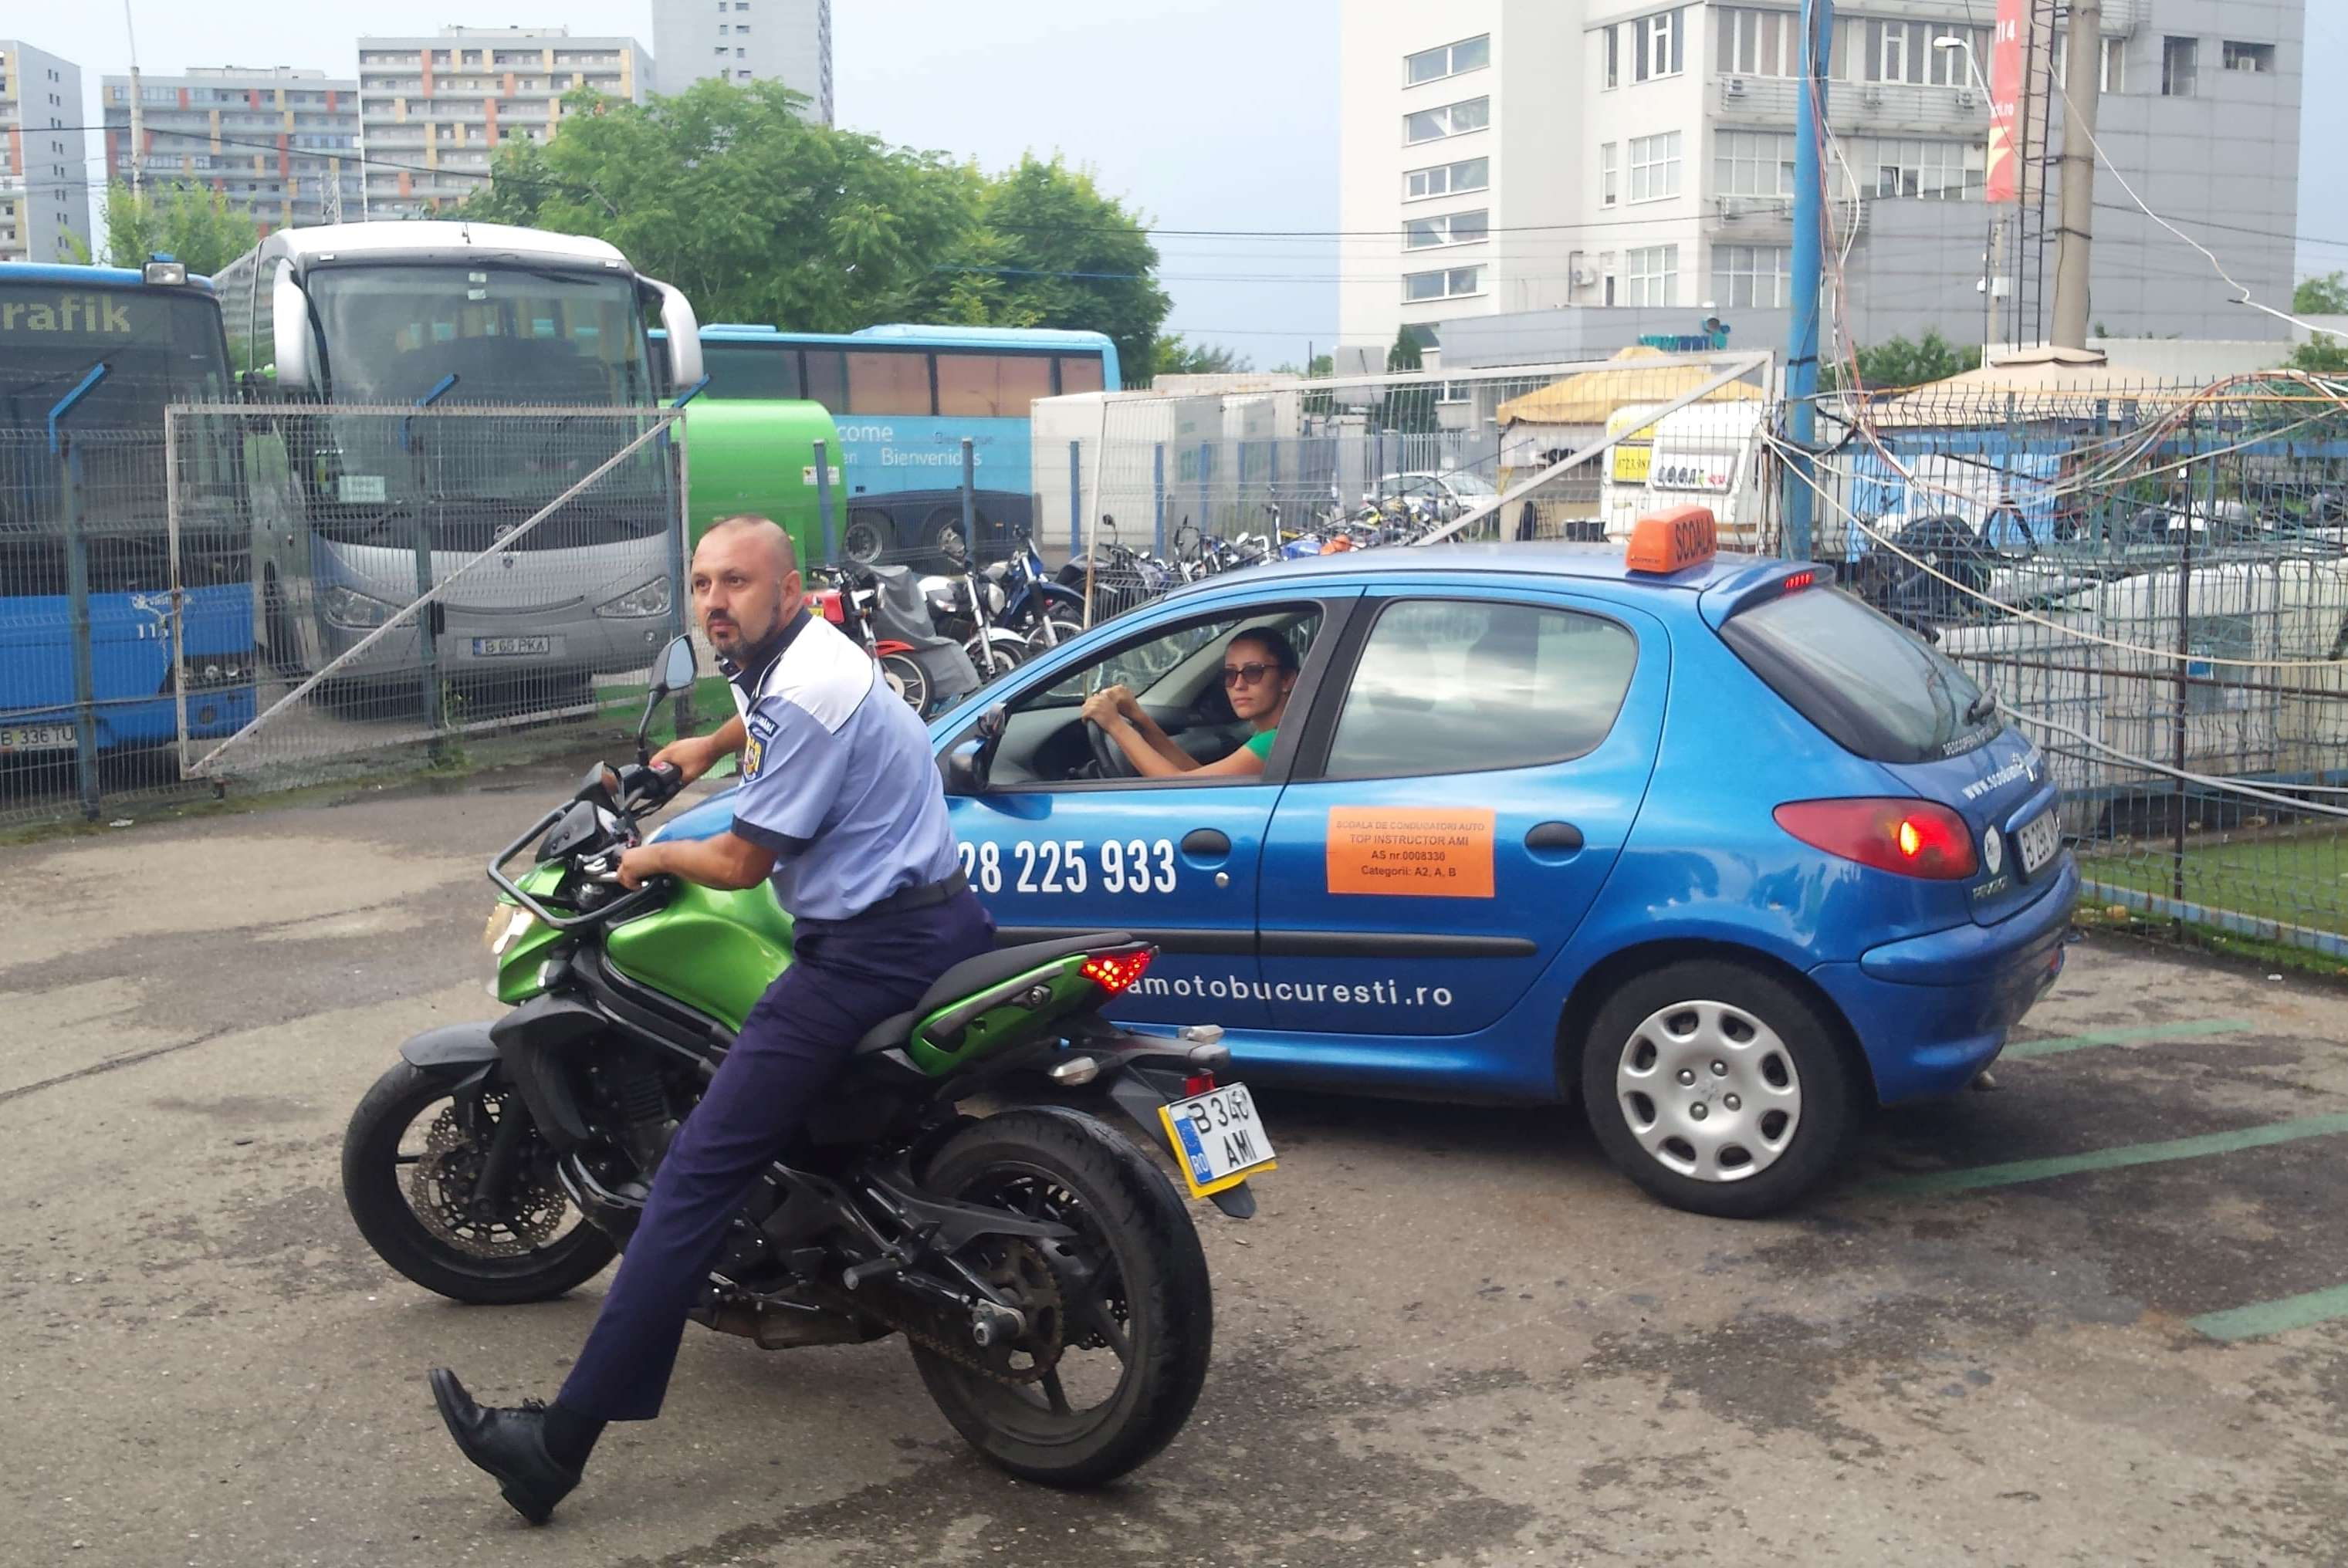 Curs de siguranta rutiera - Politia Rutiera - scoala moto